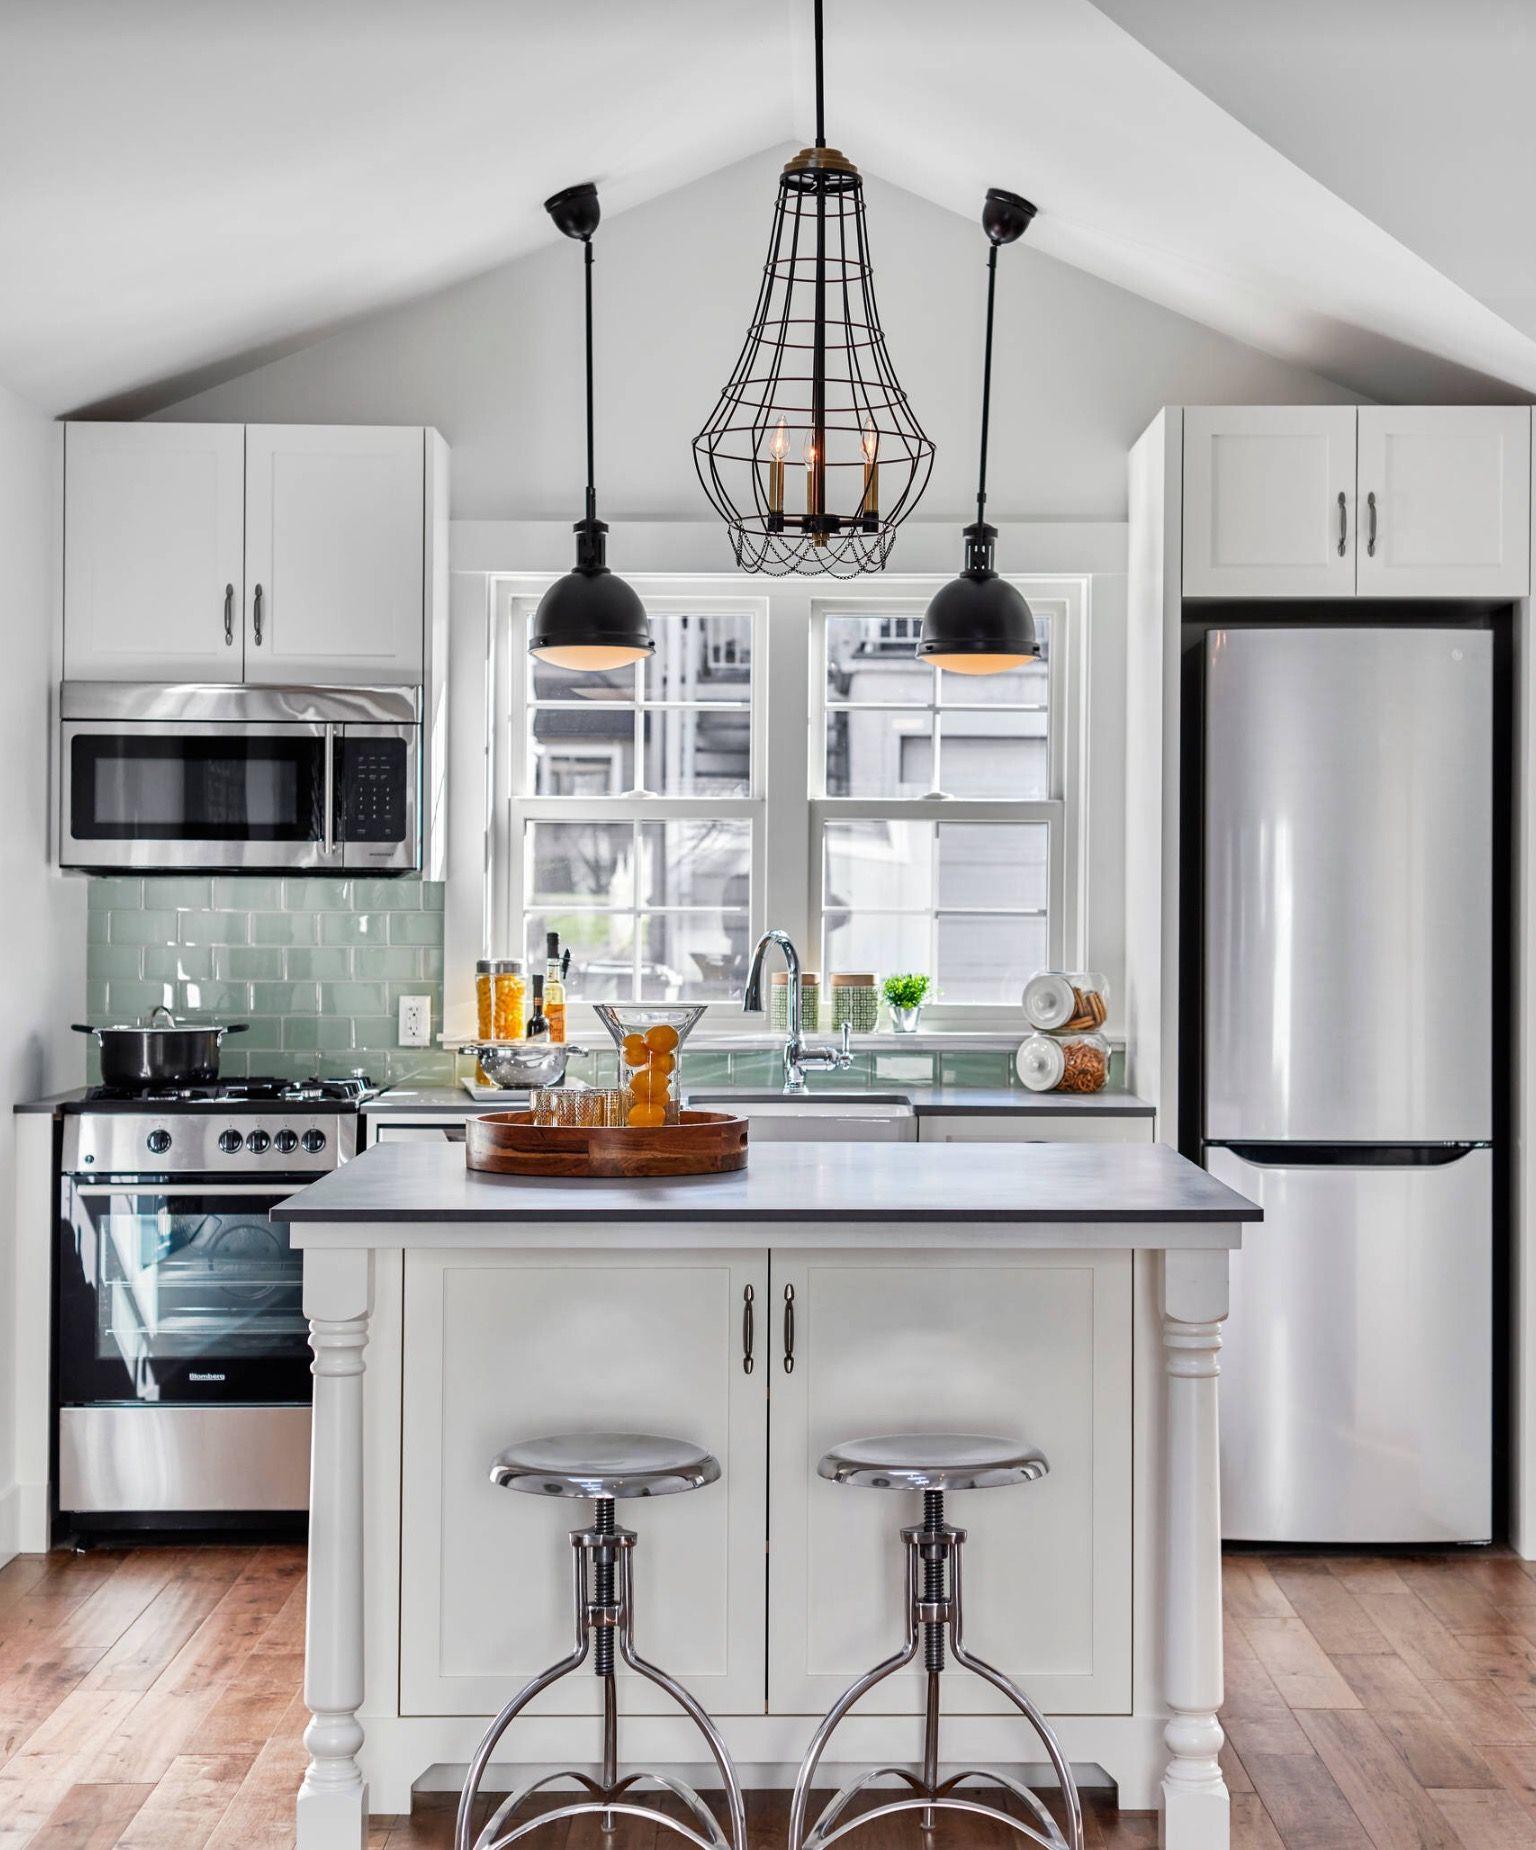 Guest house   Small kitchen layouts, Kitchen design small, Kitchen ...